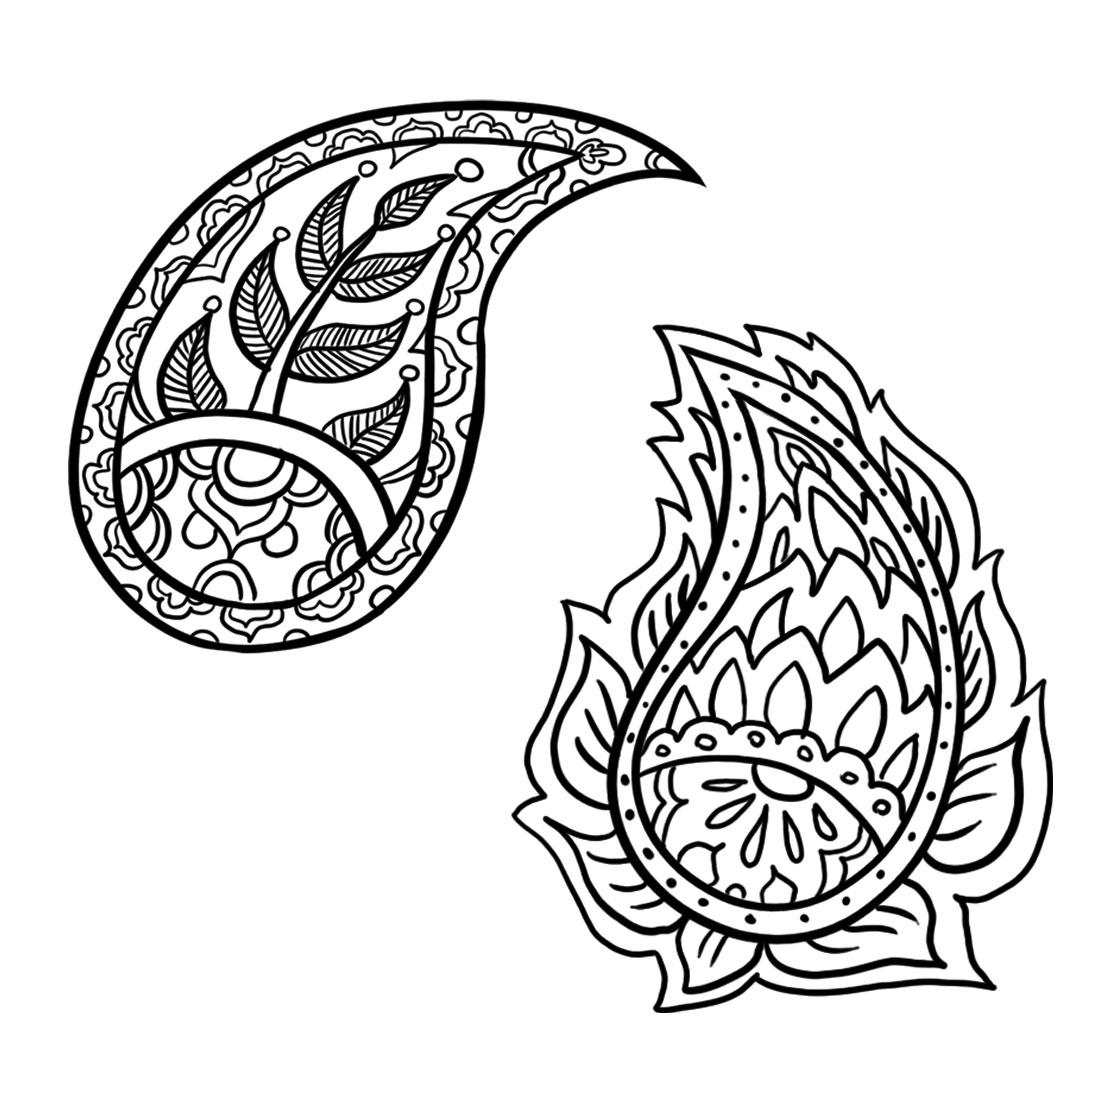 Mandala Designs Drawing At Getdrawings Com Free For Personal Use